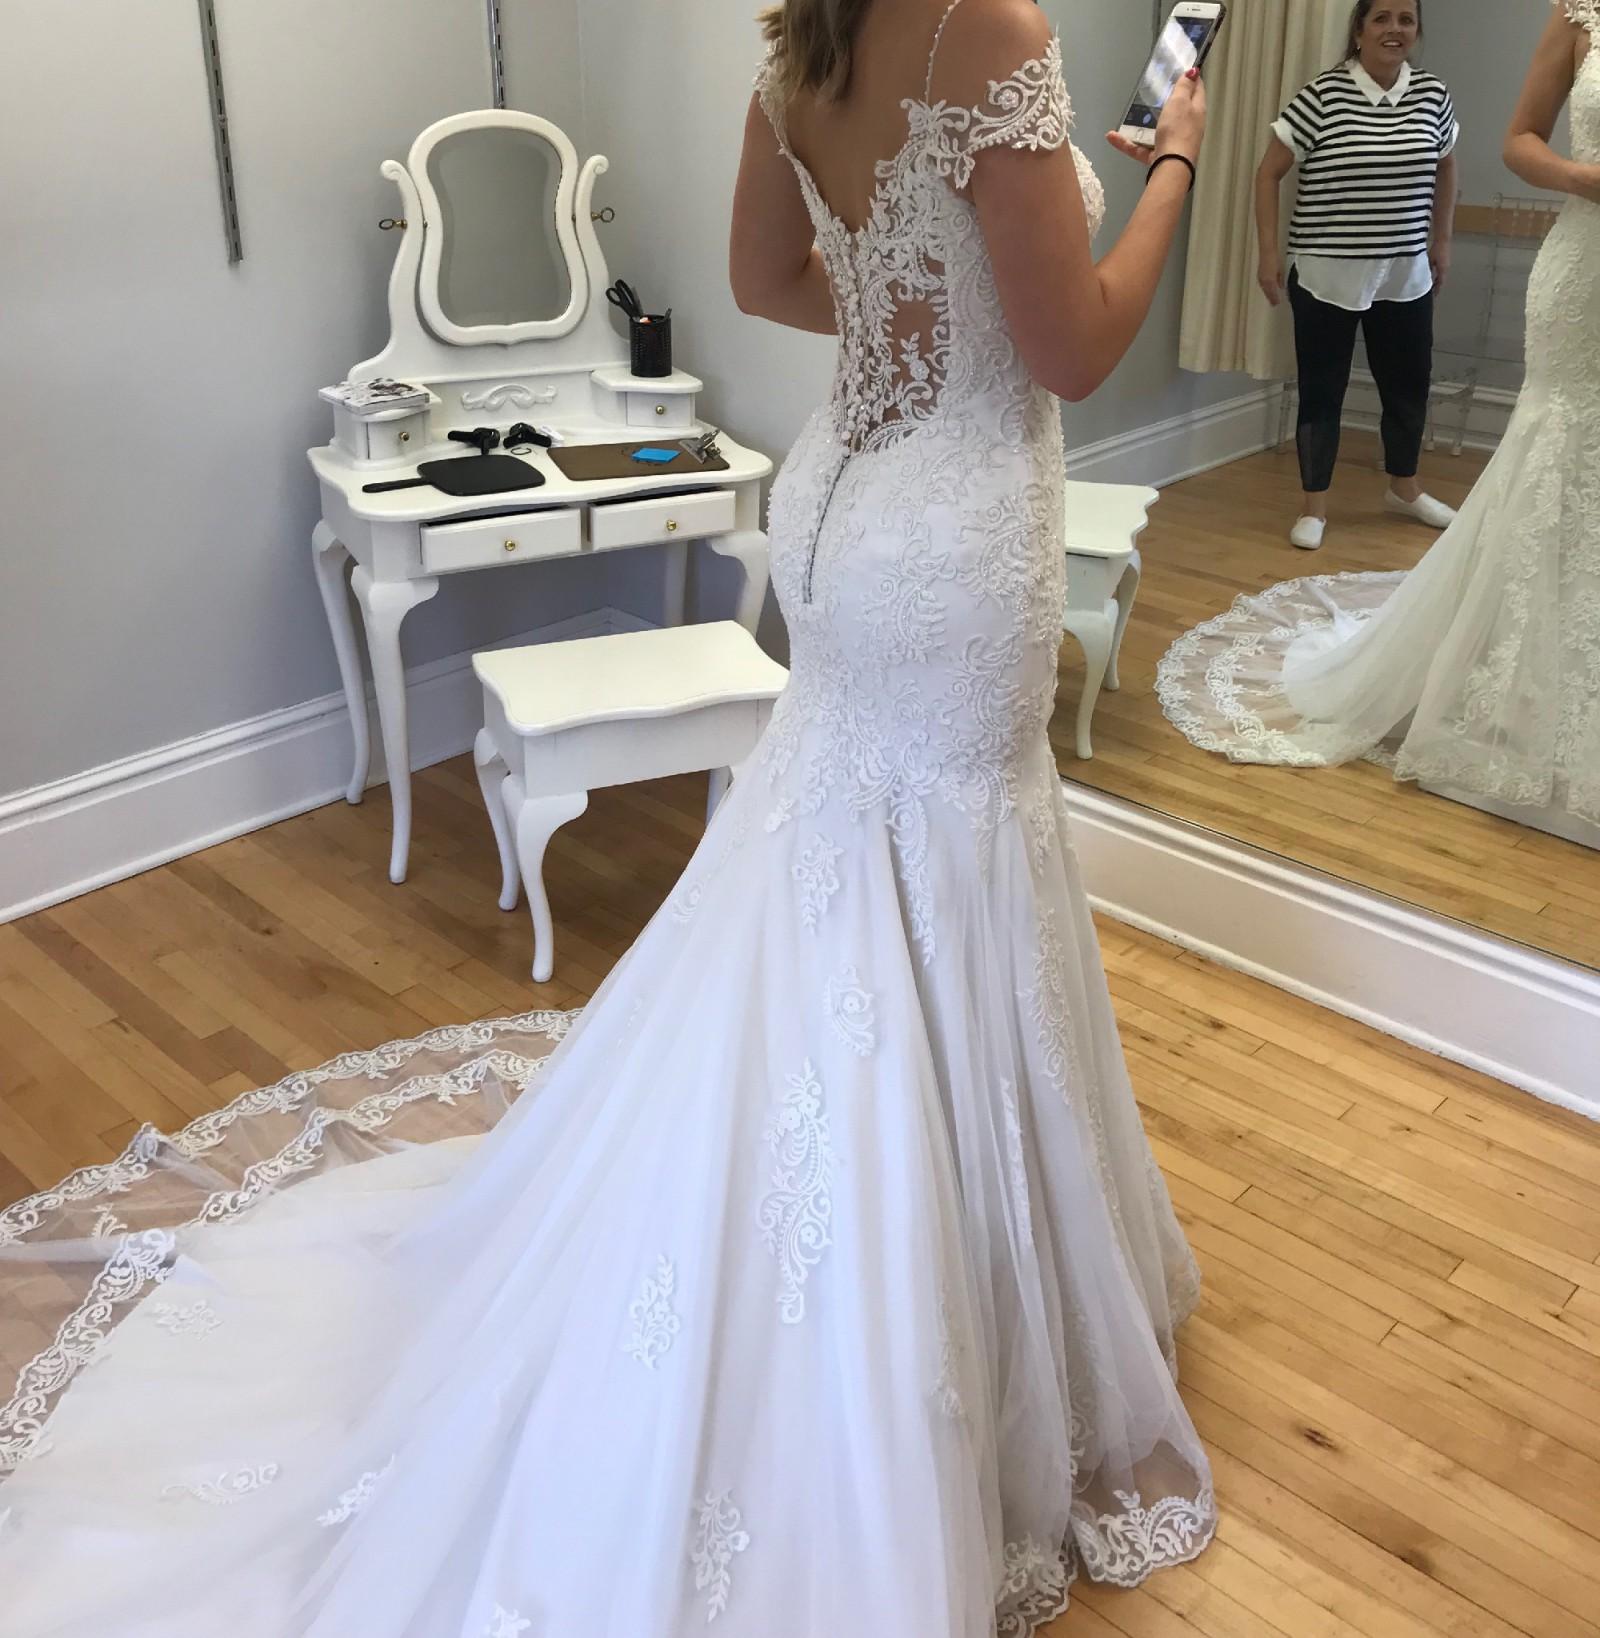 Cheap Wedding Dresses Mn: Maggie Sottero Della New Wedding Dress On Sale 39% Off